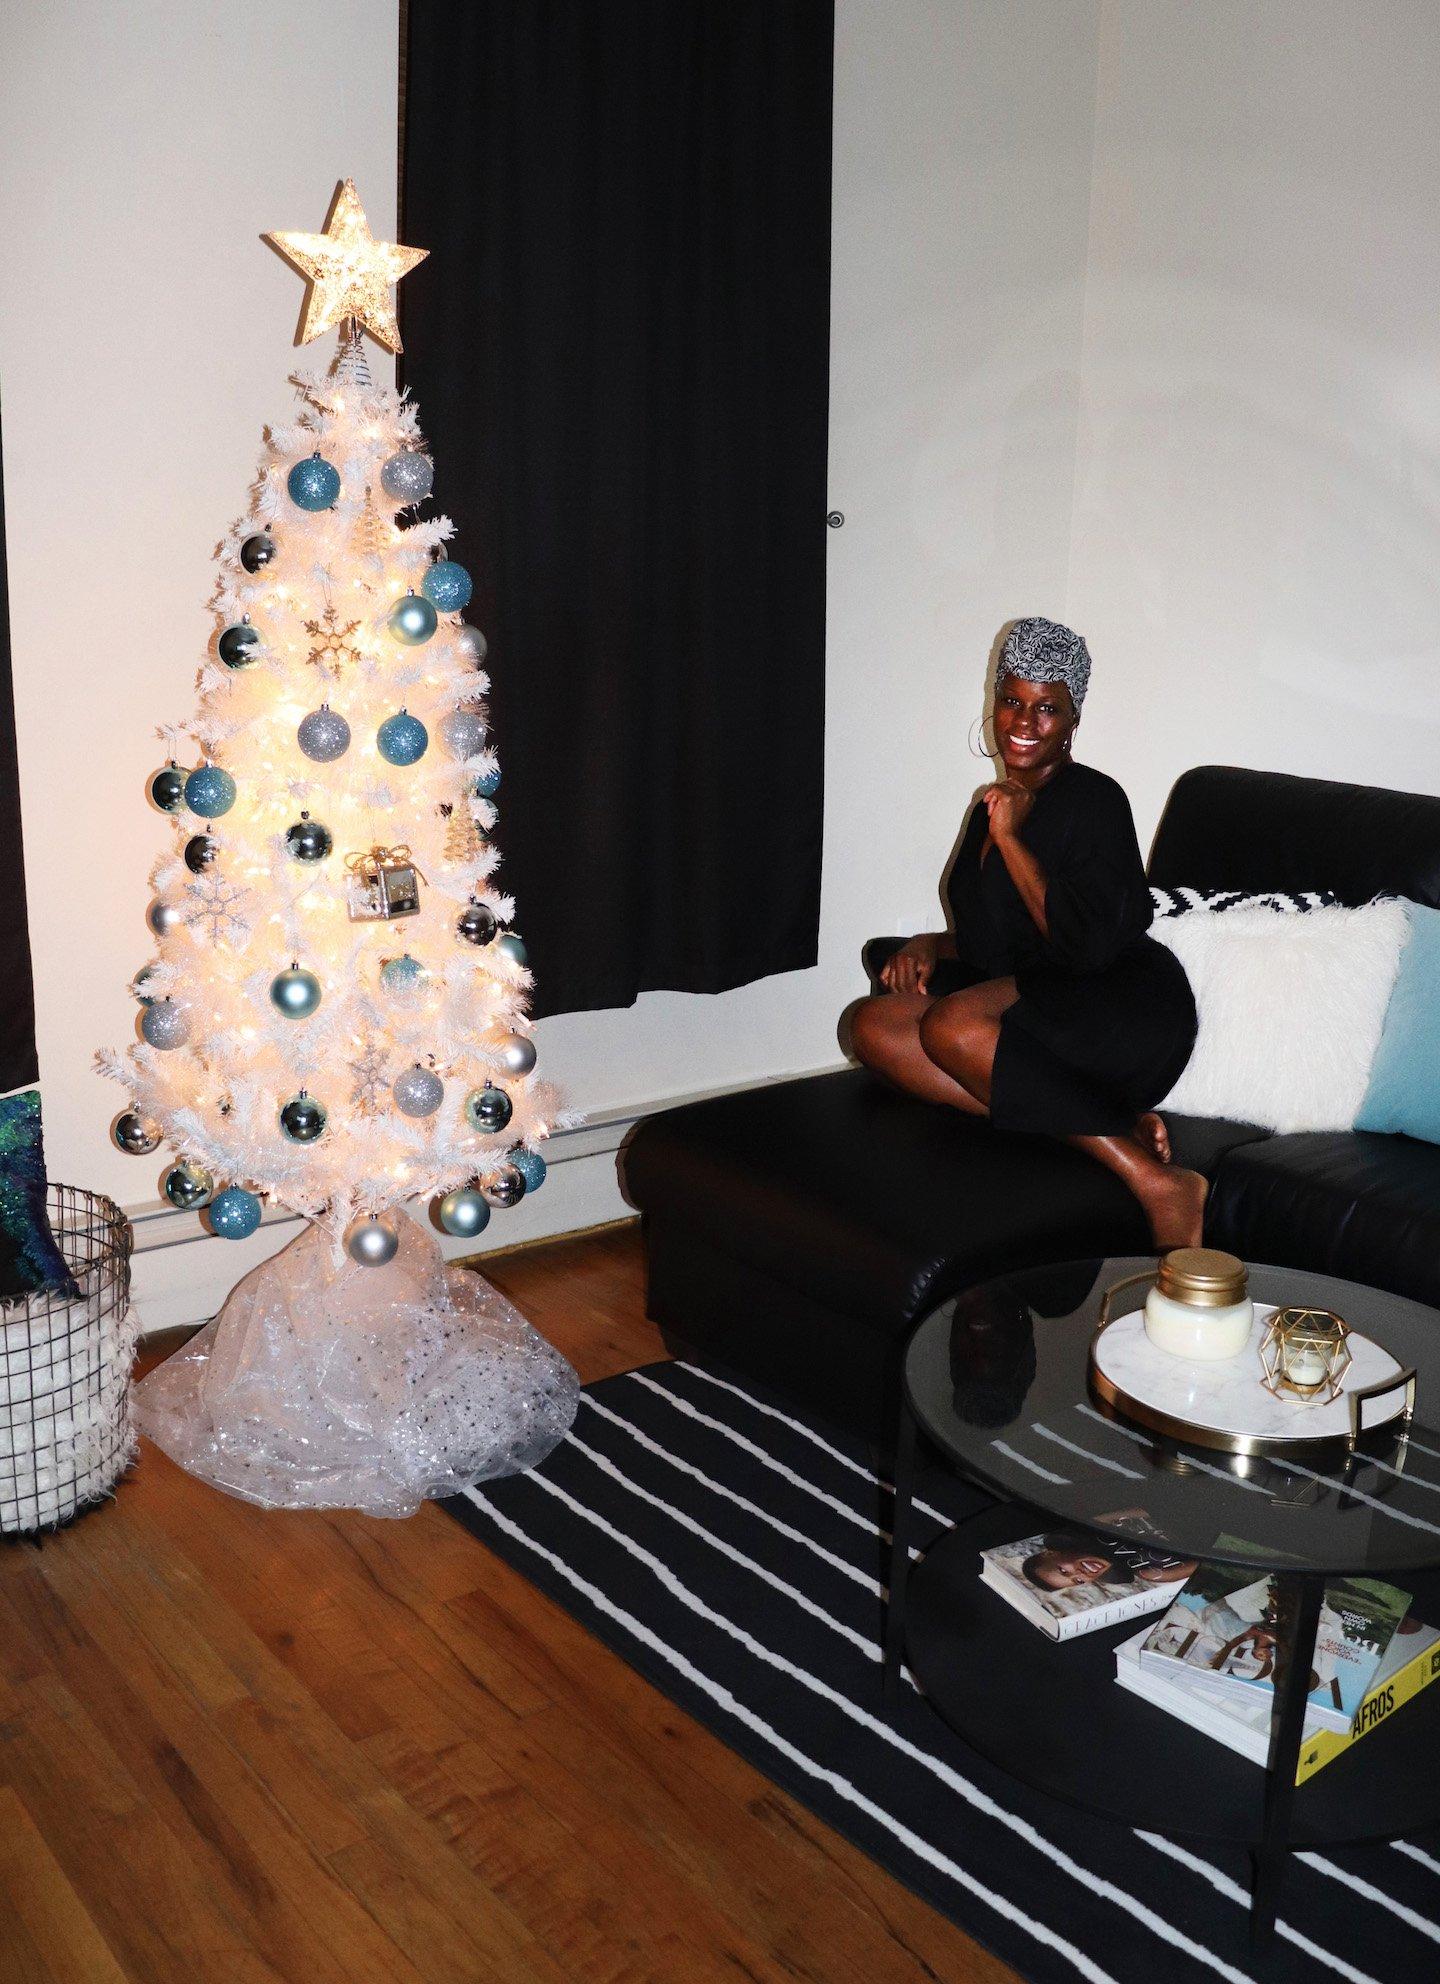 Stylish Christmas Tree To Match Home Decor